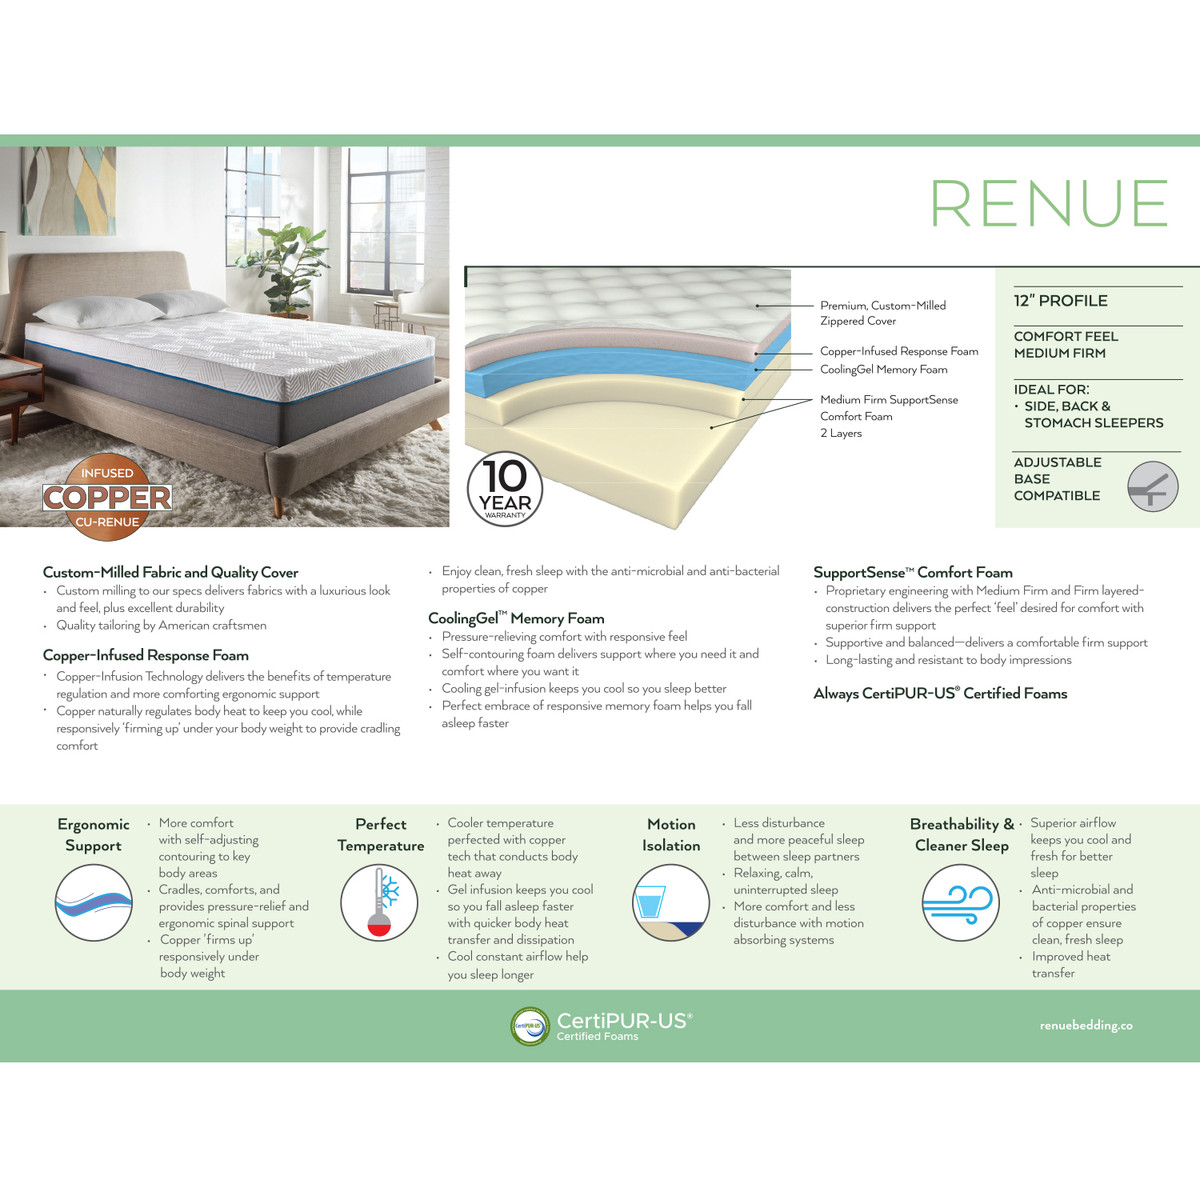 Renue Twelve Inch Memory Foam Mattress and Box